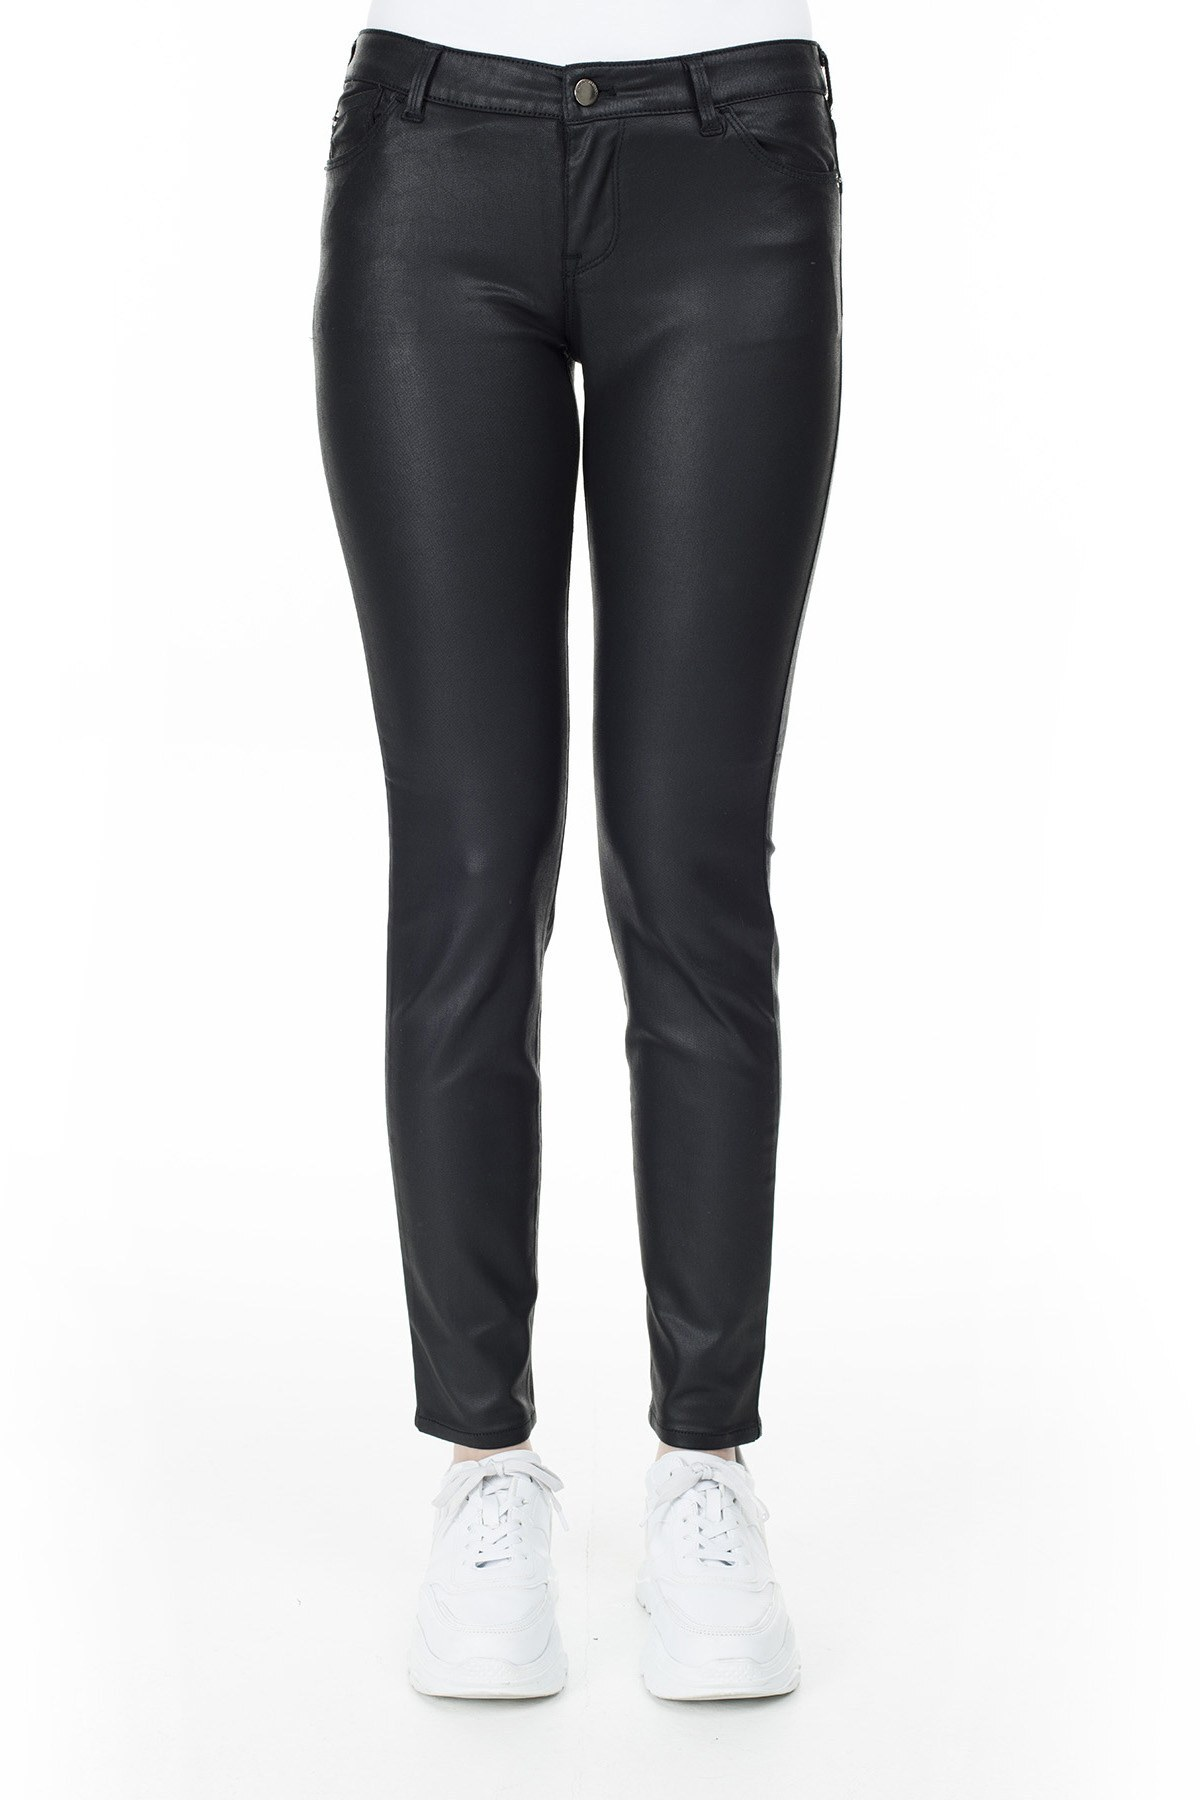 Emporio Armani J23 Jeans Bayan Pamuklu Pantolon S 6G2J23 2NSWZ 0999 SİYAH